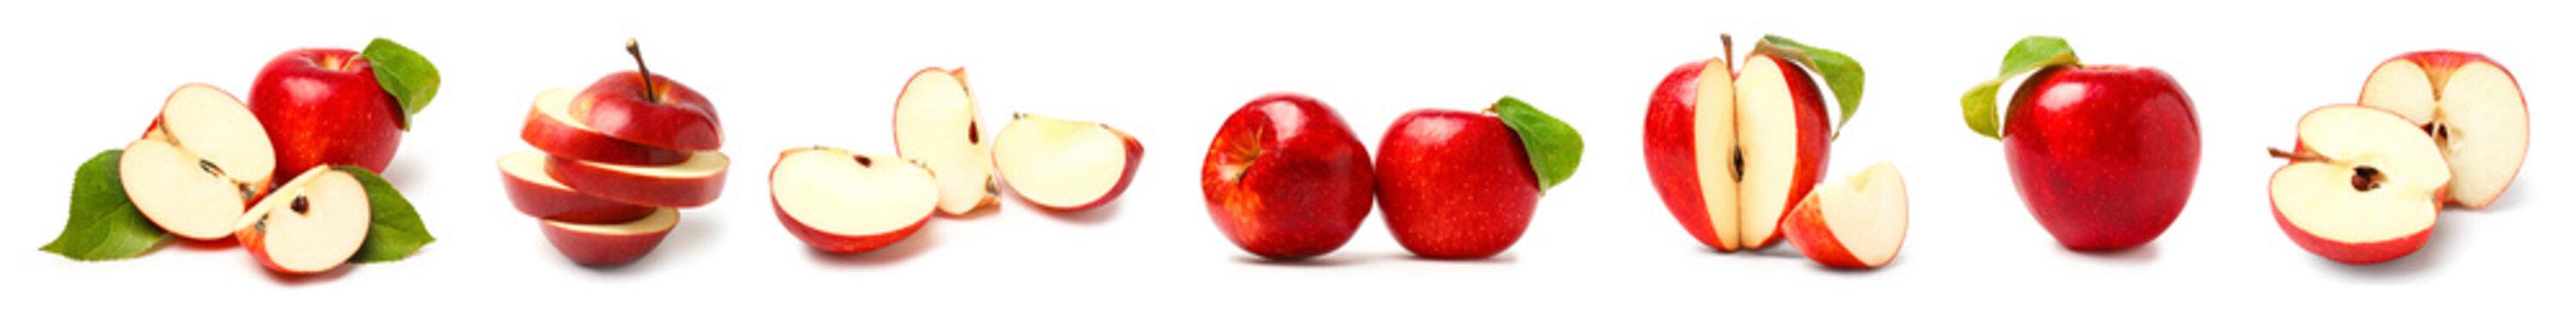 Set of fresh apples on white background